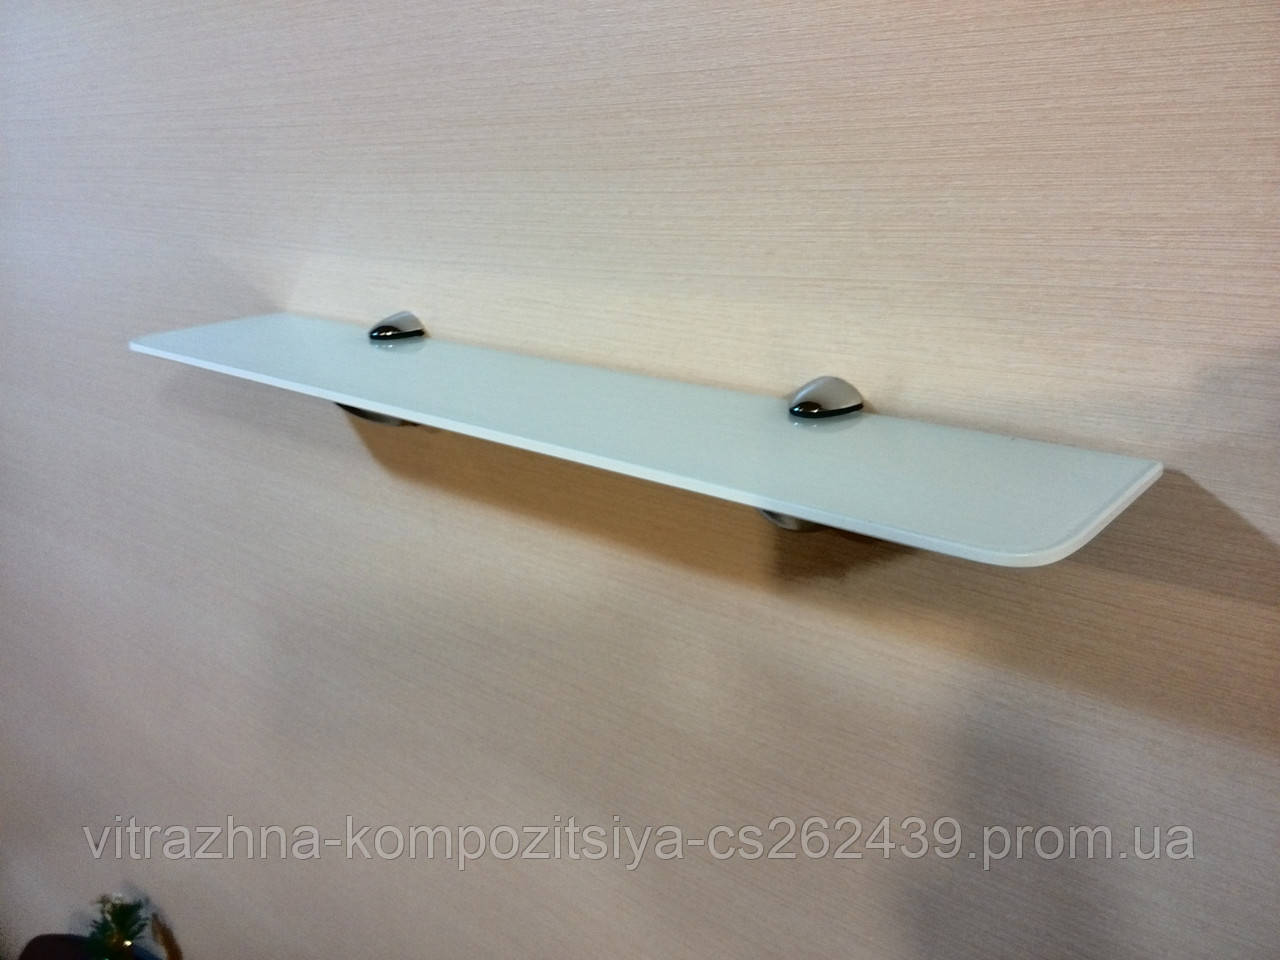 Полка 4 мм стеклянная прямая белая 50х10 см